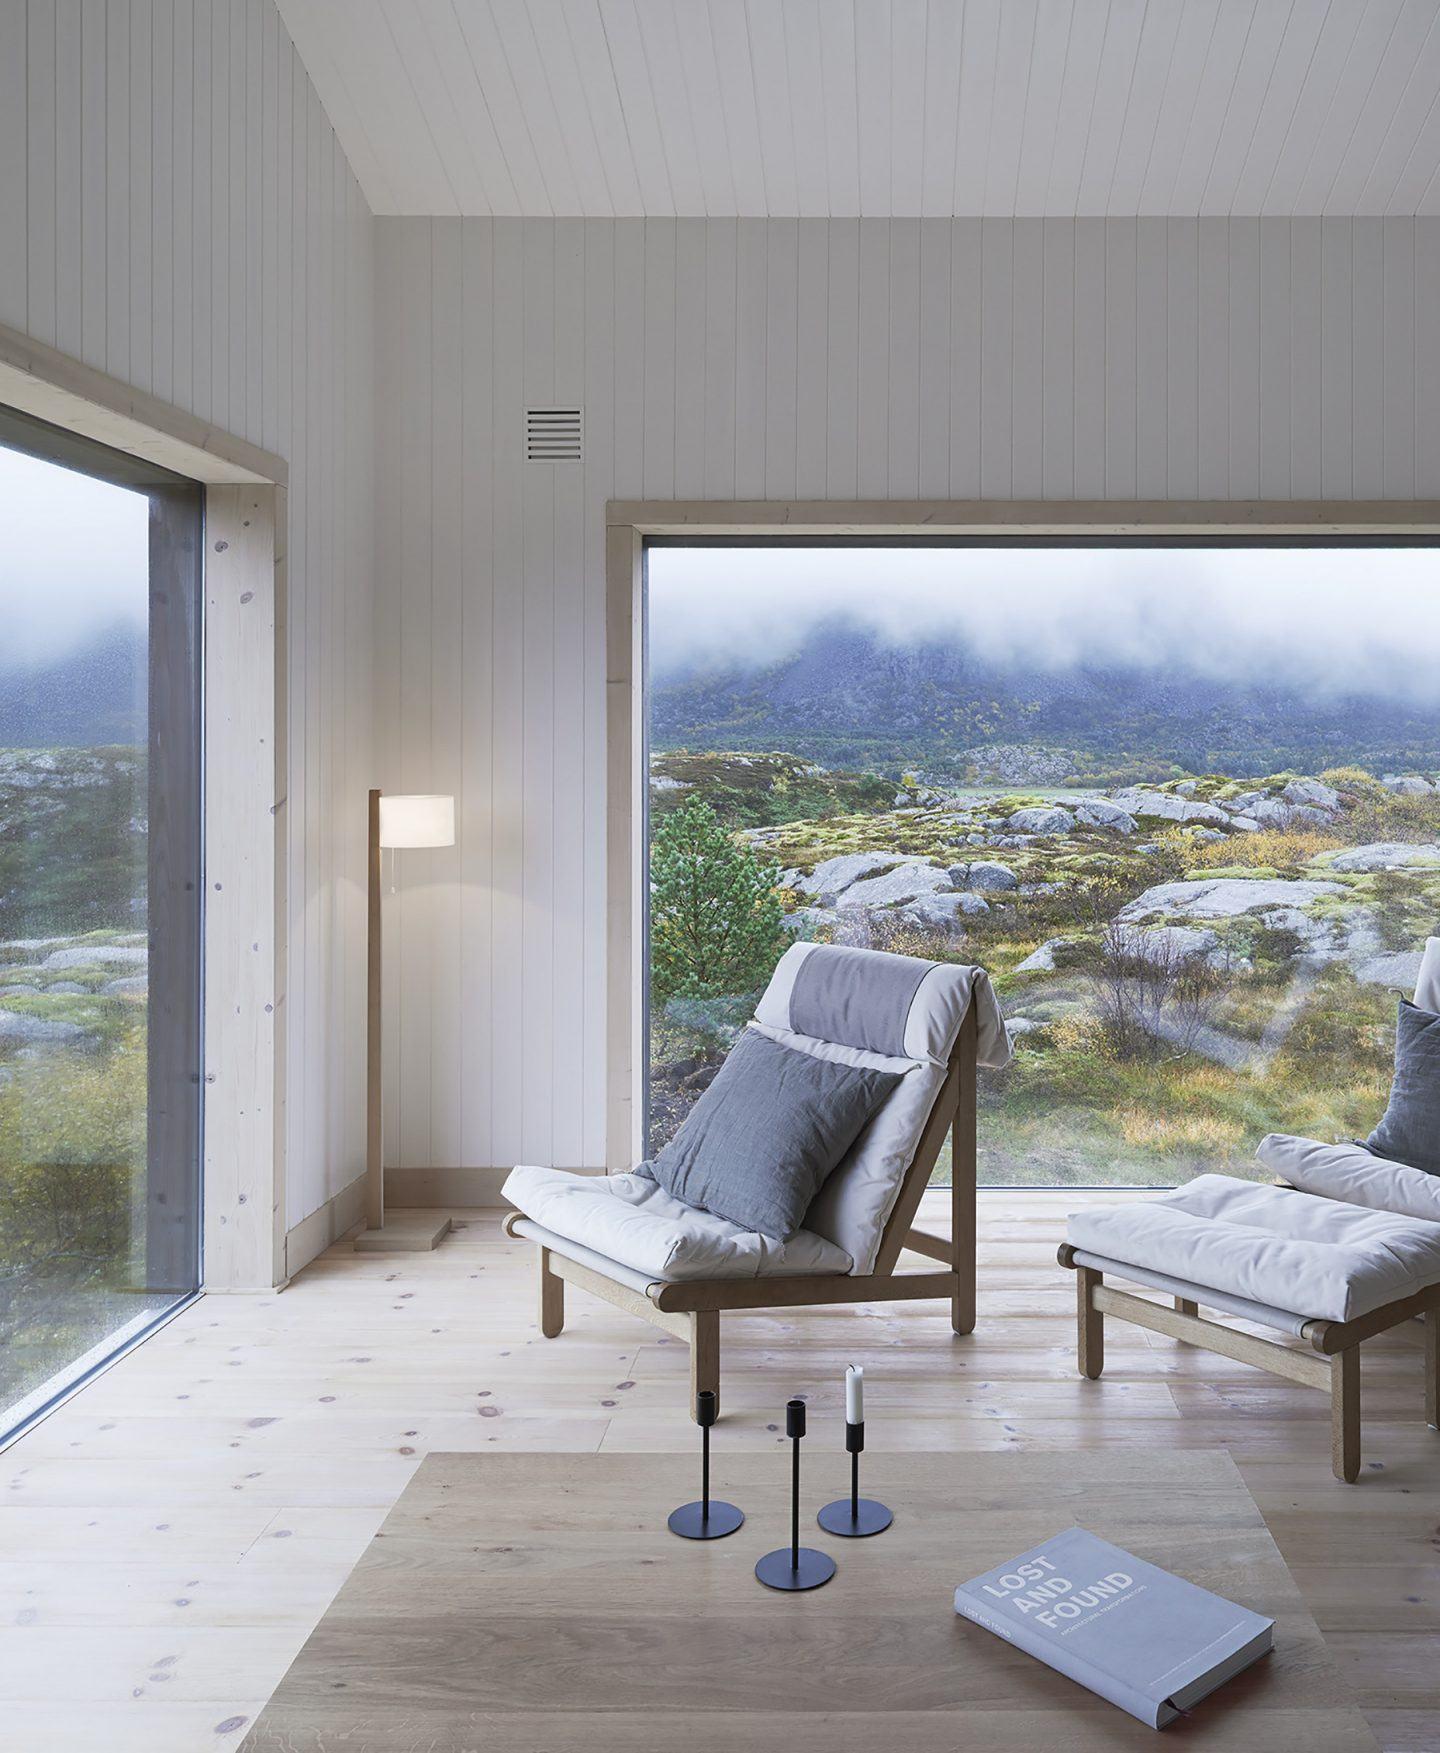 IGNANT-Architecture-Kolman-Boye-Vega-Cottage-1